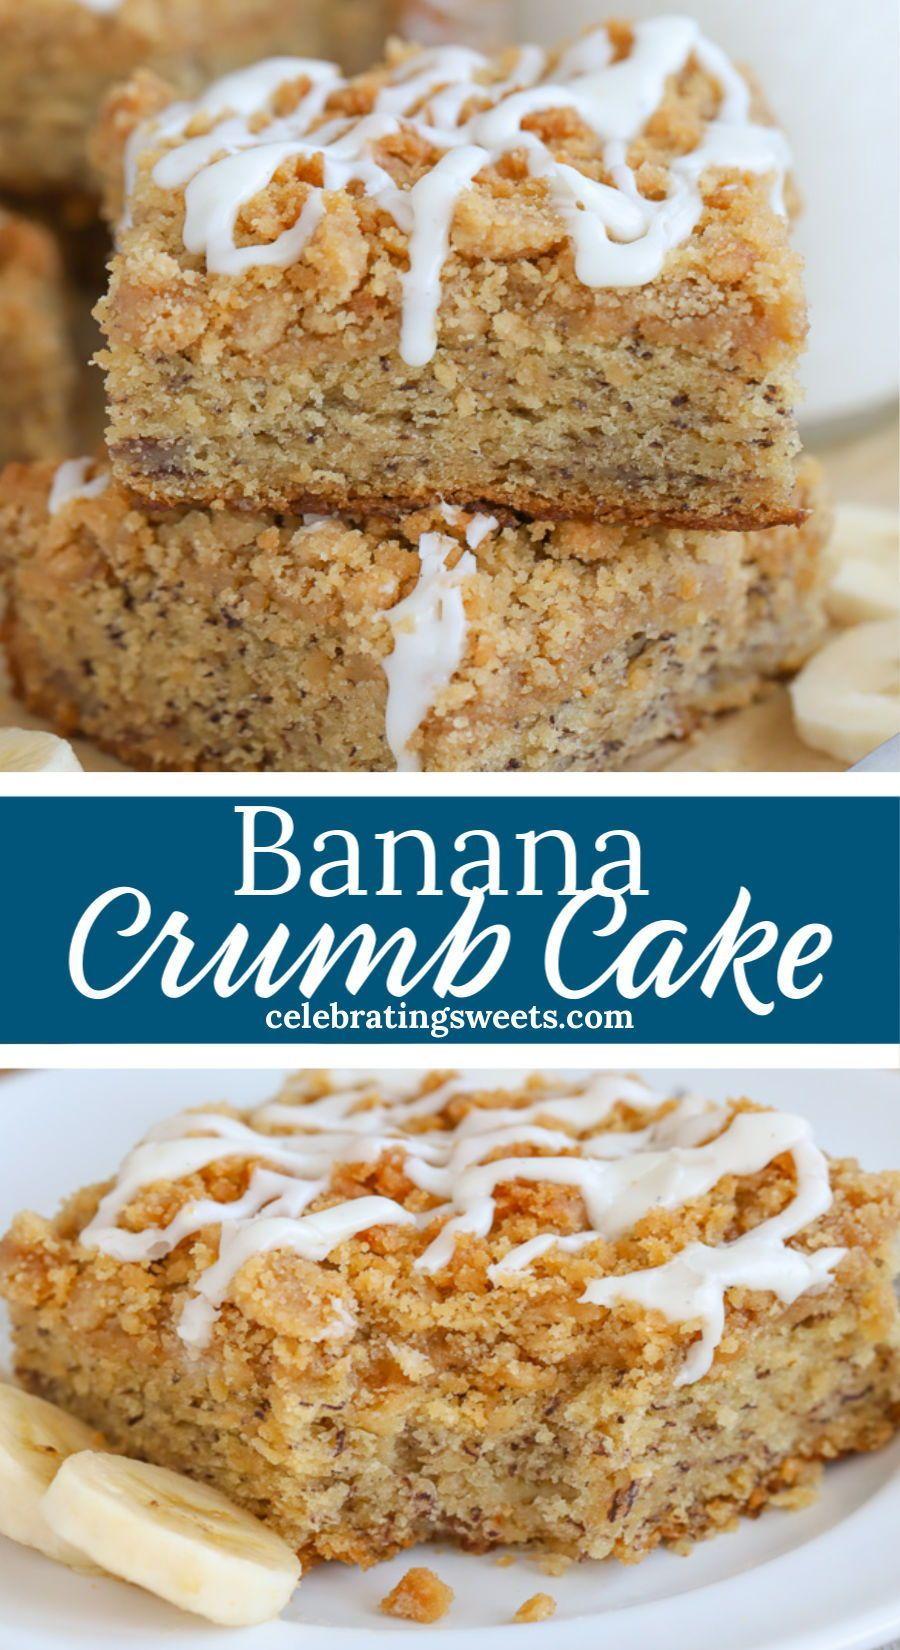 entenmann's louisiana crunch cake review